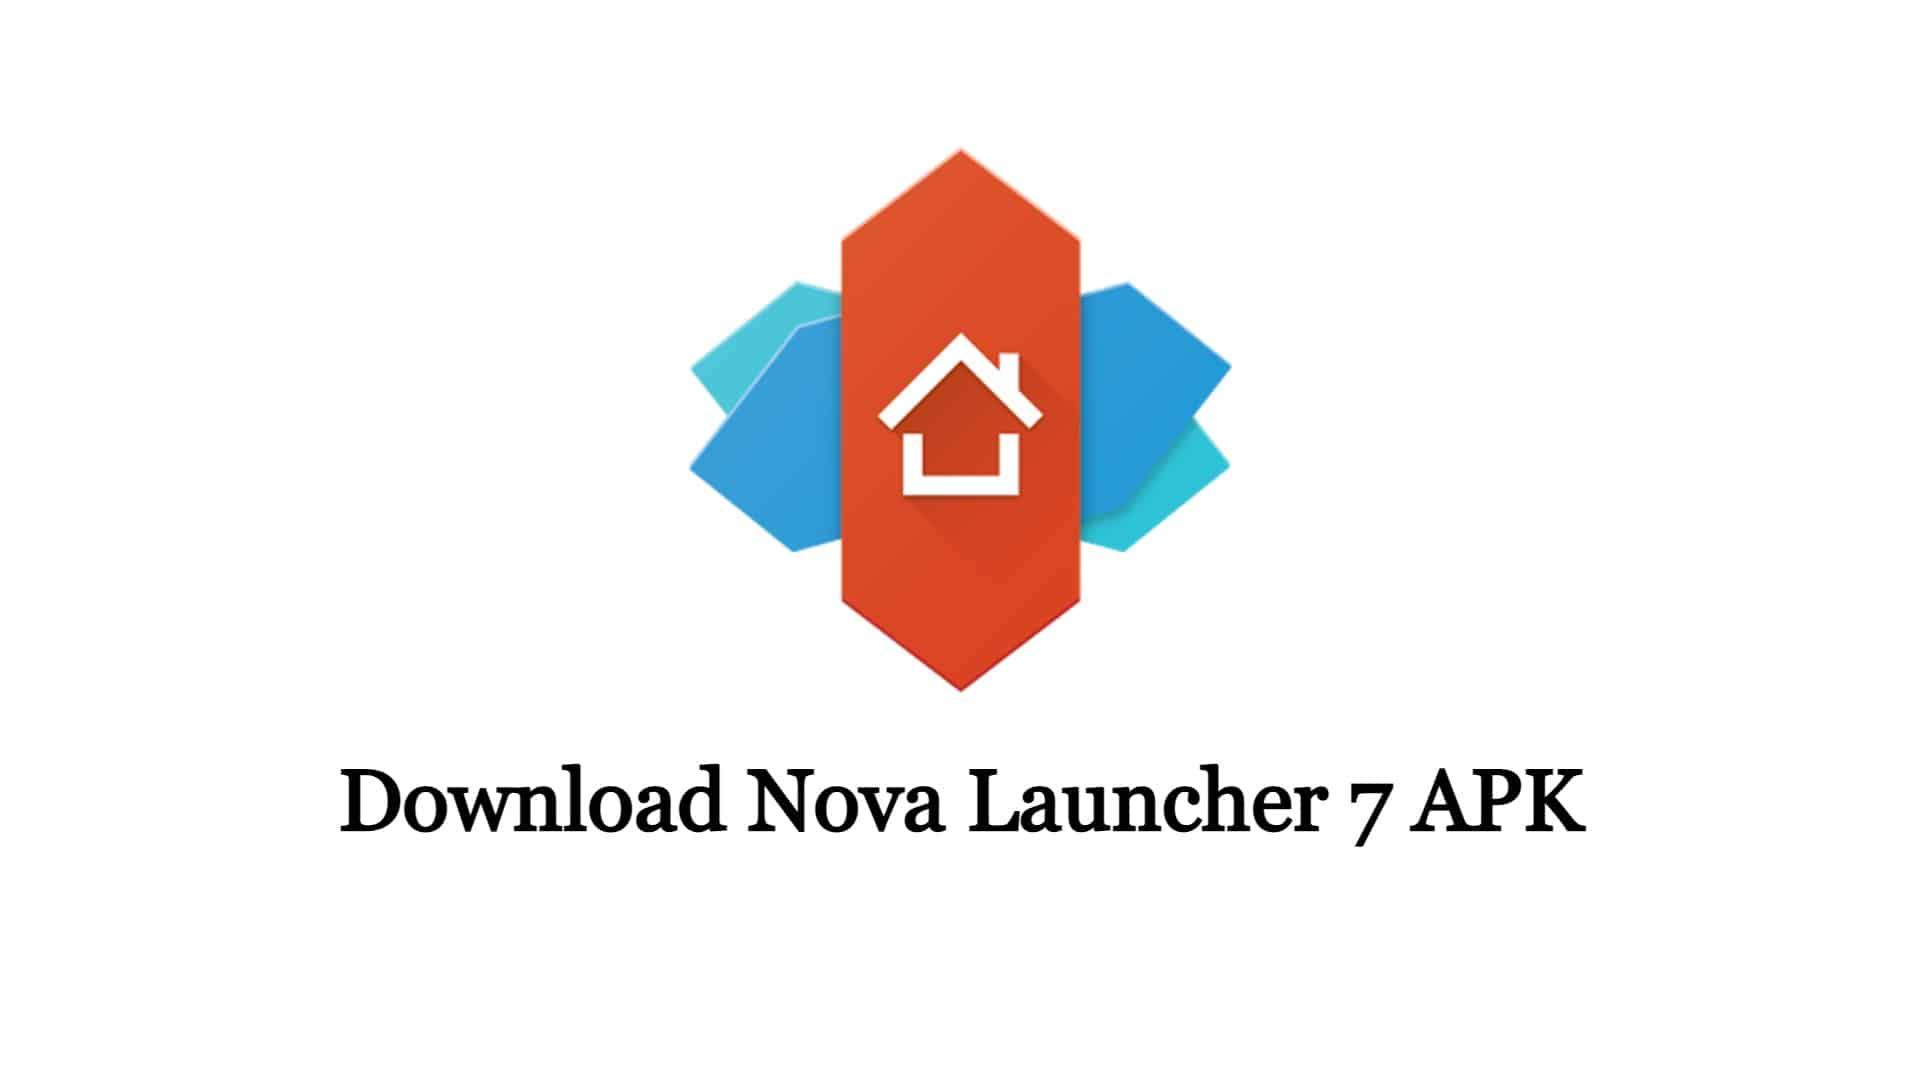 Nova Launcher 7 APK